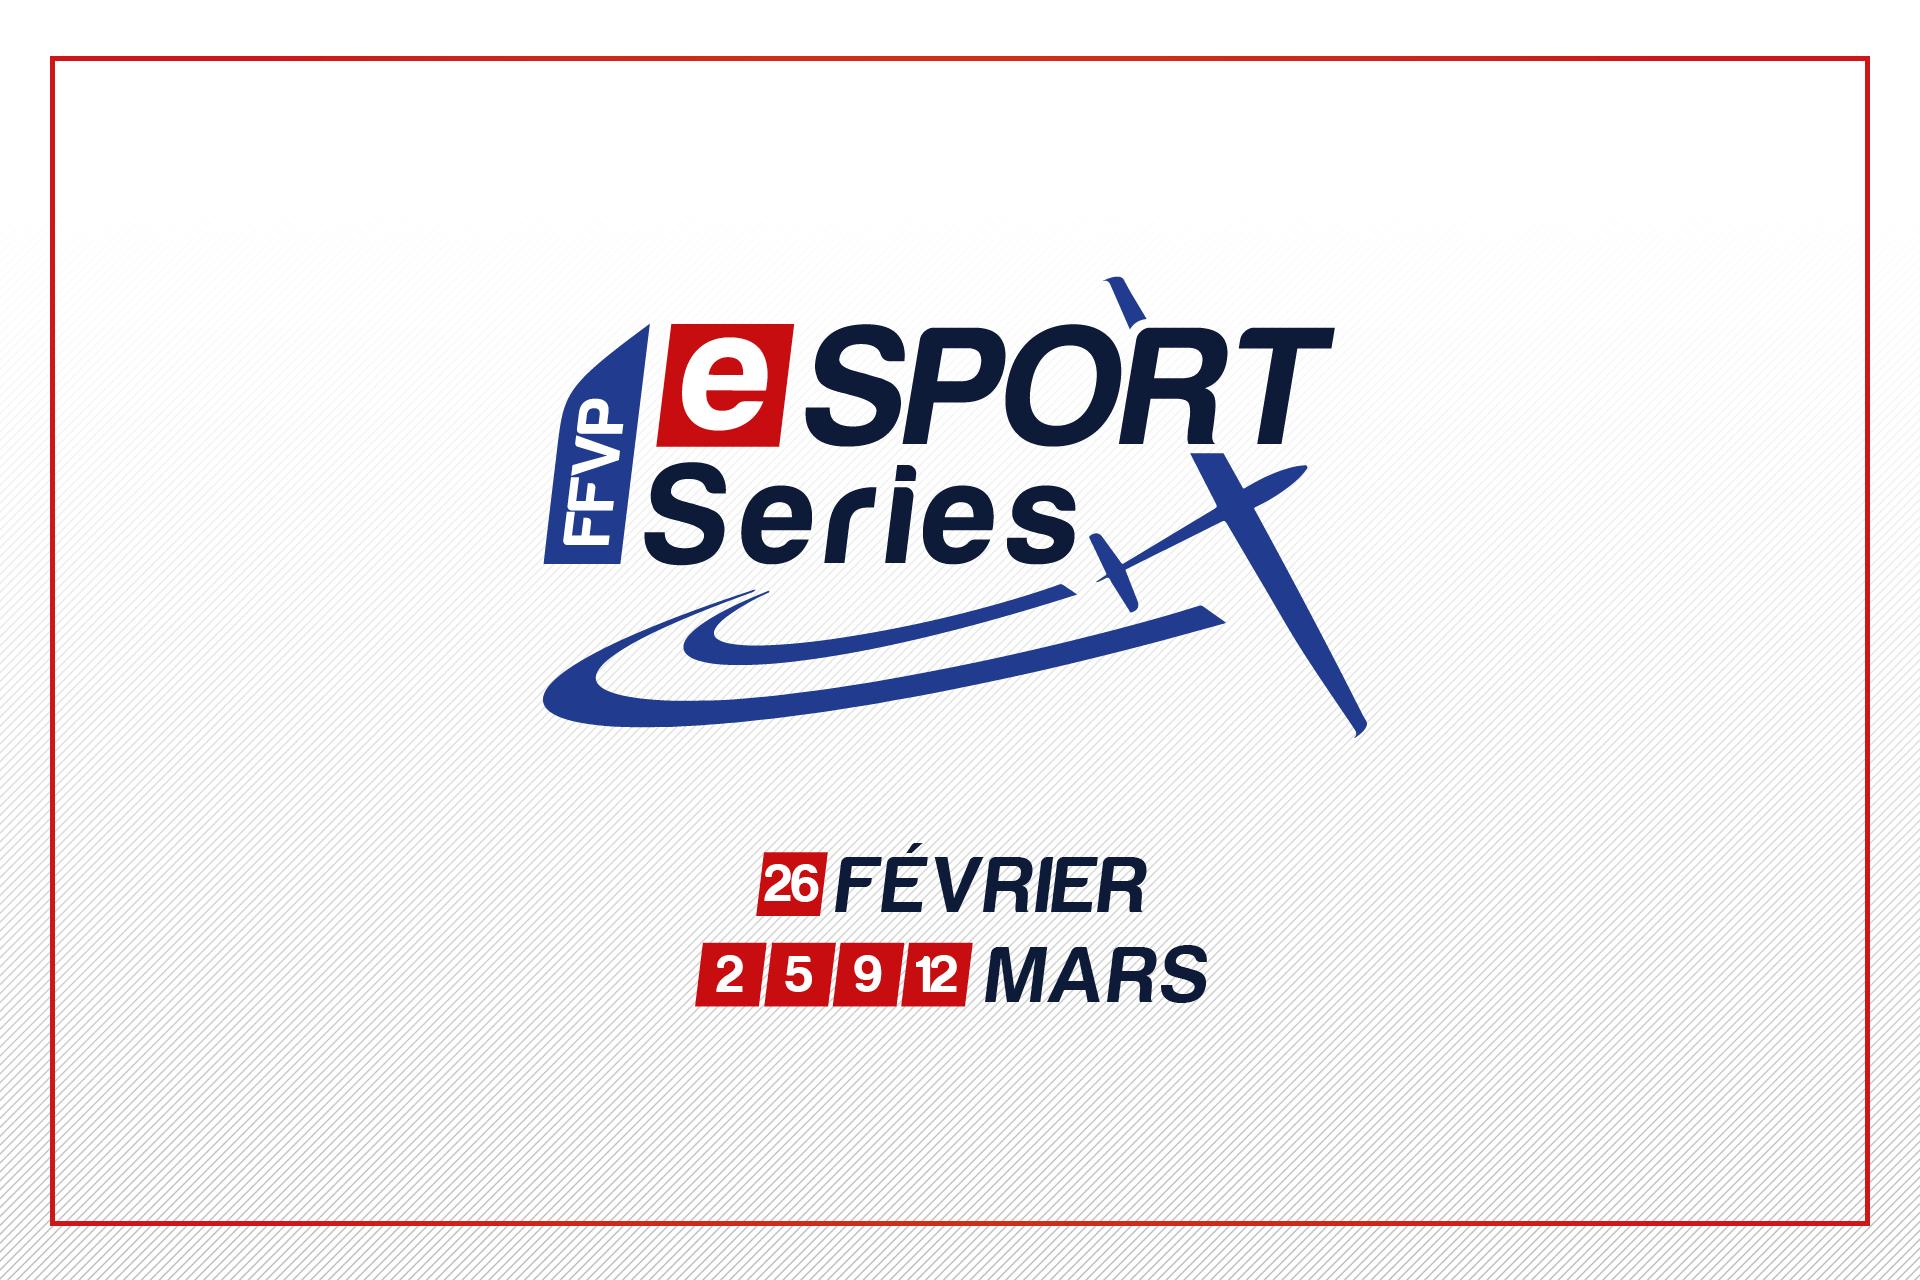 FFVP eSport Series – Février et Mars 2021